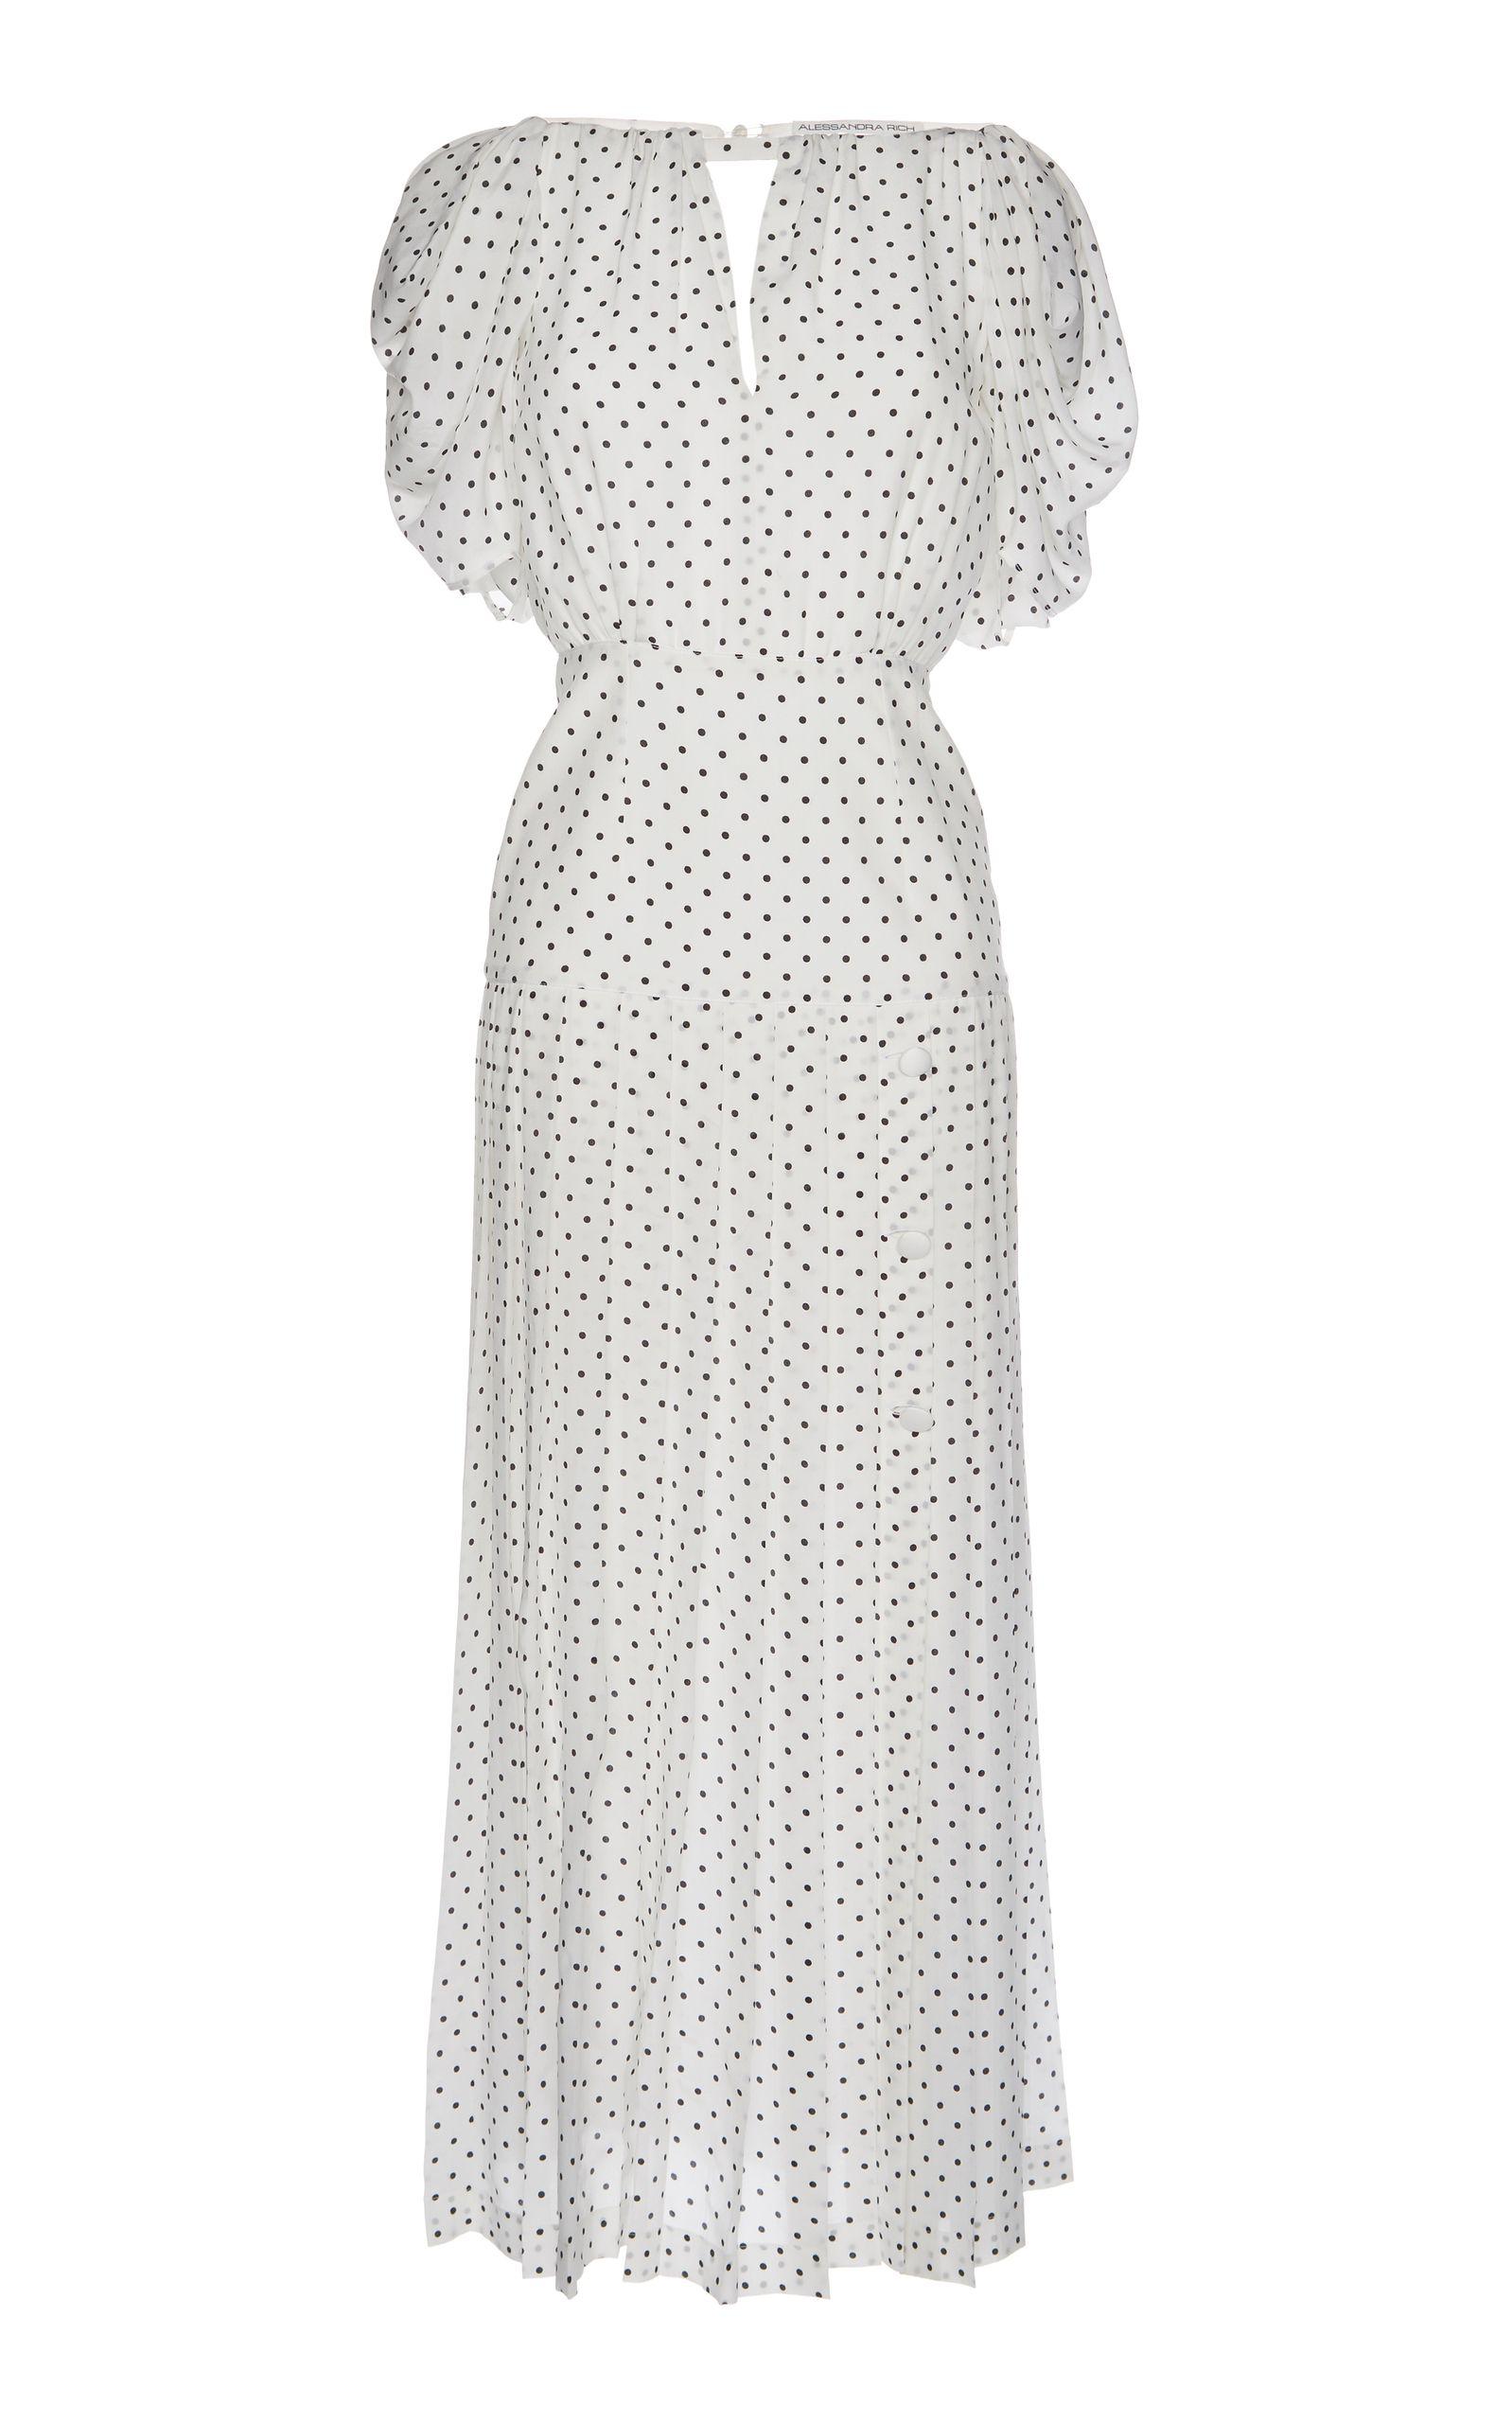 207909423c642 ALESSANDRA RICH POLKA DOT MAXI DRESS. #alessandrarich #cloth ...